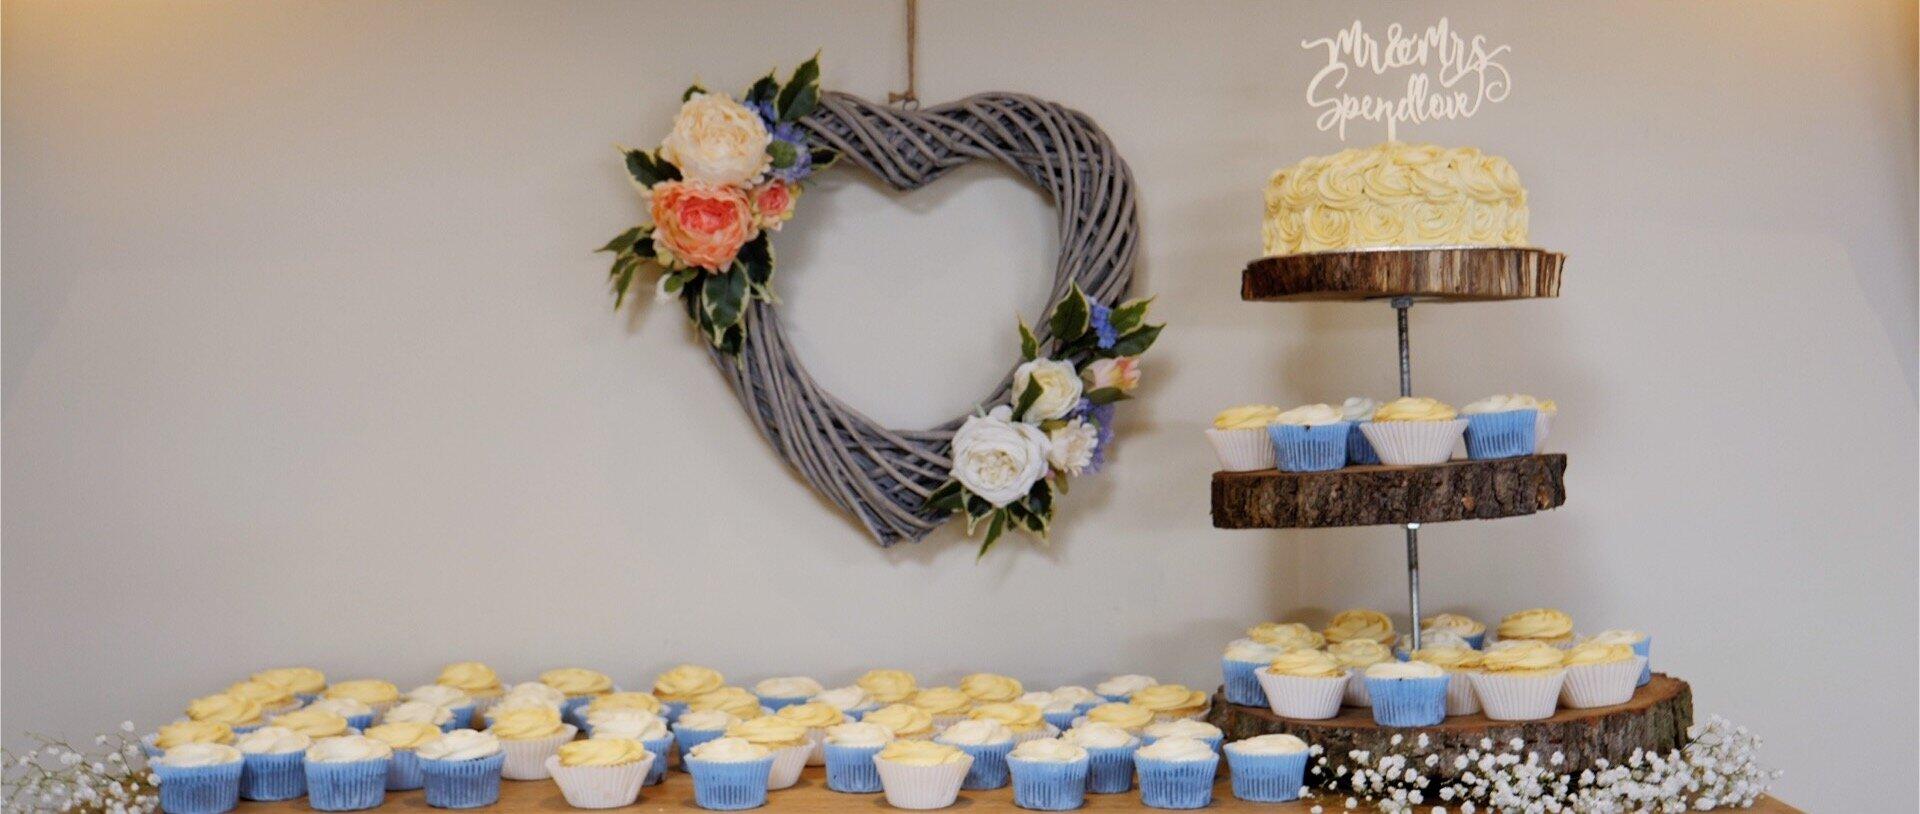 The wedding cake video Essex.jpg